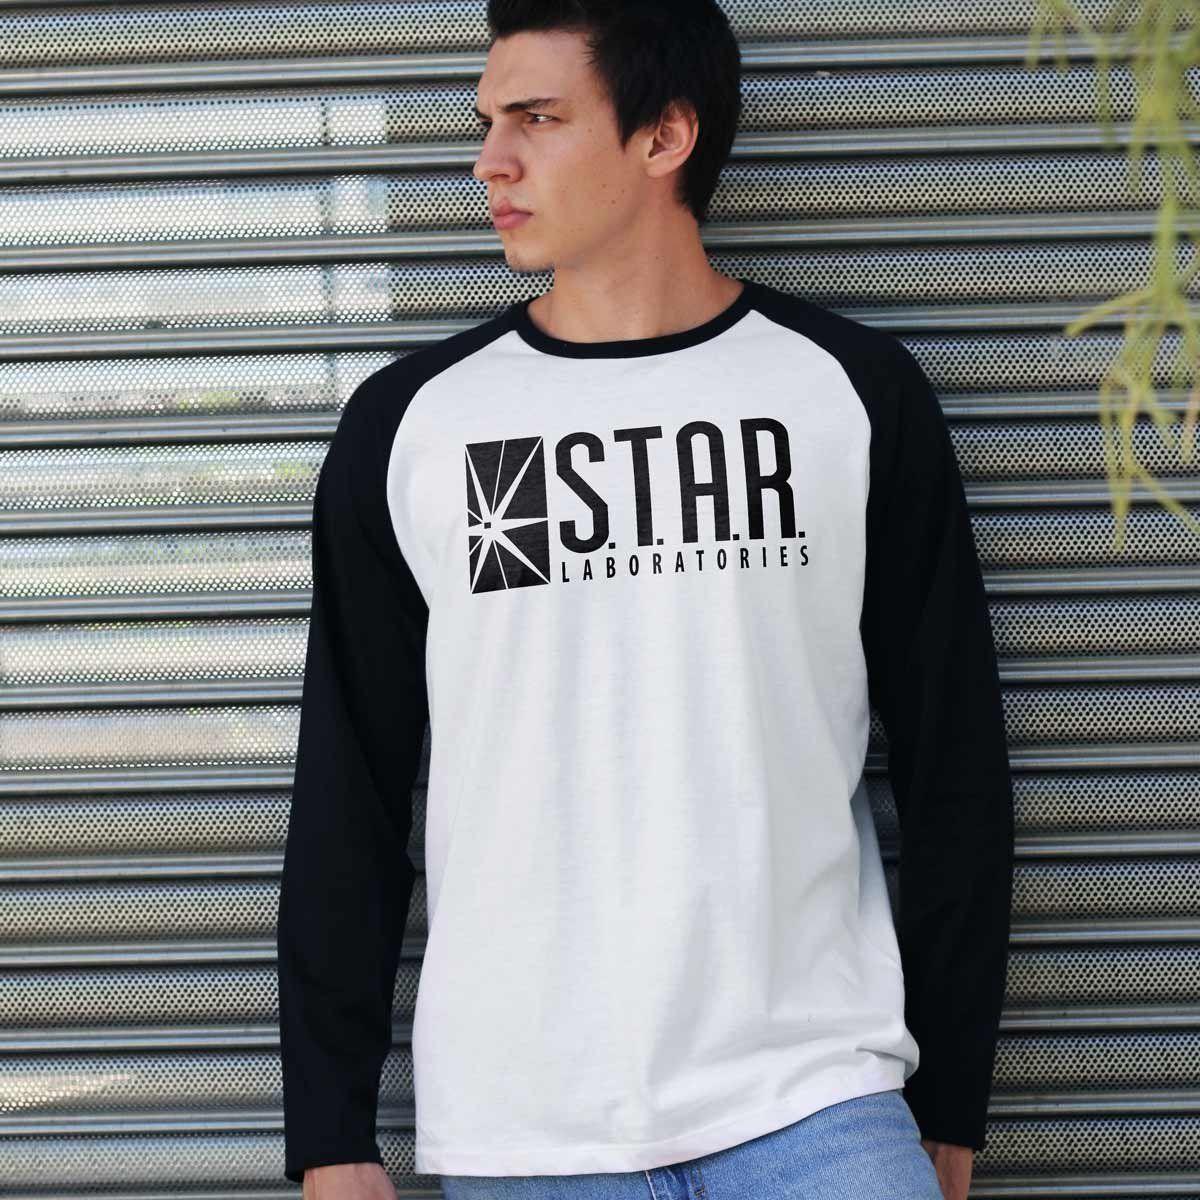 Camiseta Manga Longa Raglan Masculina The Flash Star Laboratories  - bandUP Store Marketplace